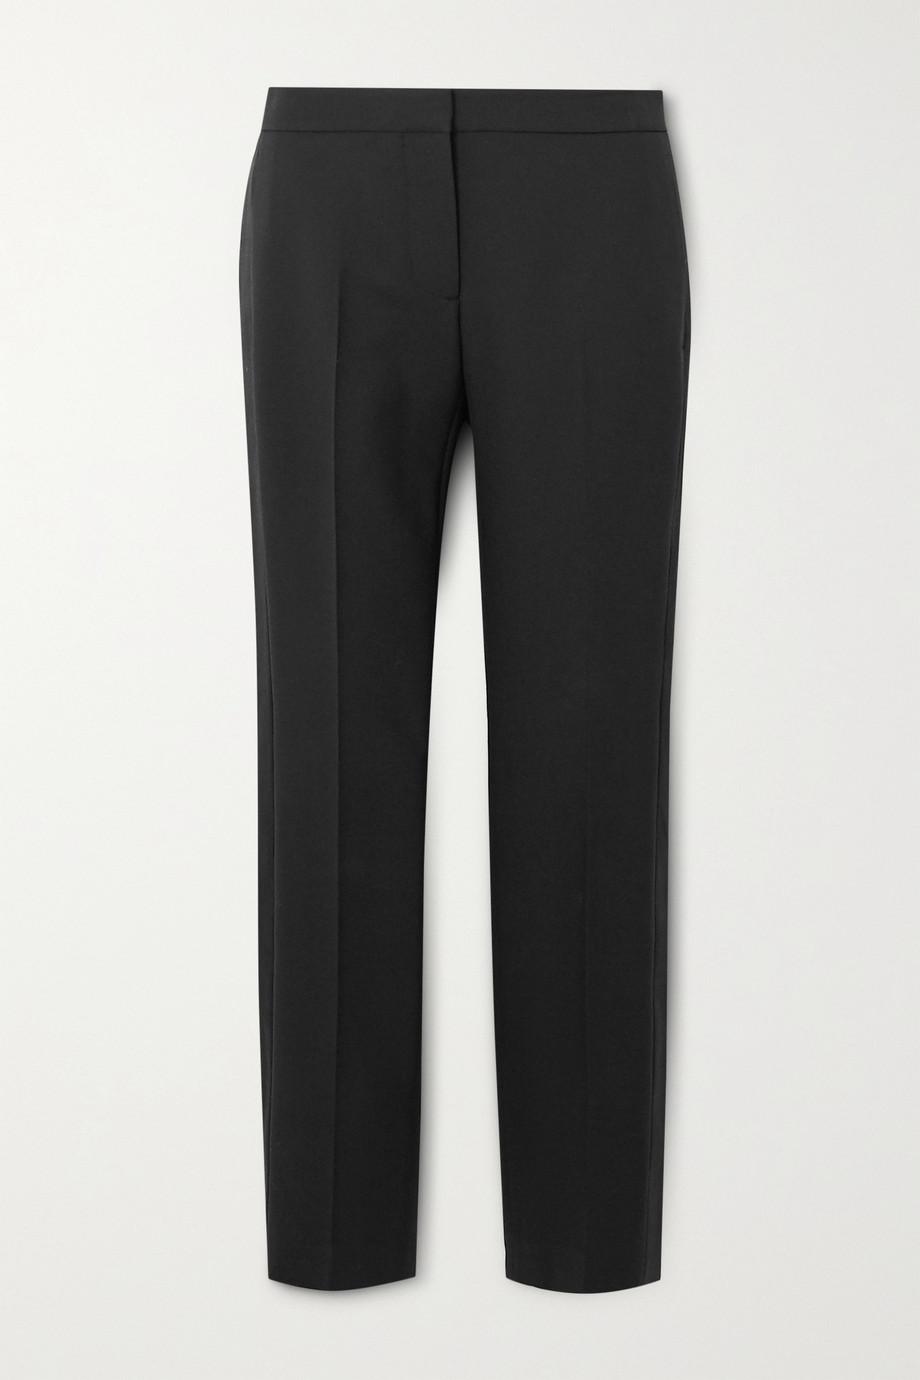 Alexander McQueen Tuxedo grain de poudre wool-blend tapered pants